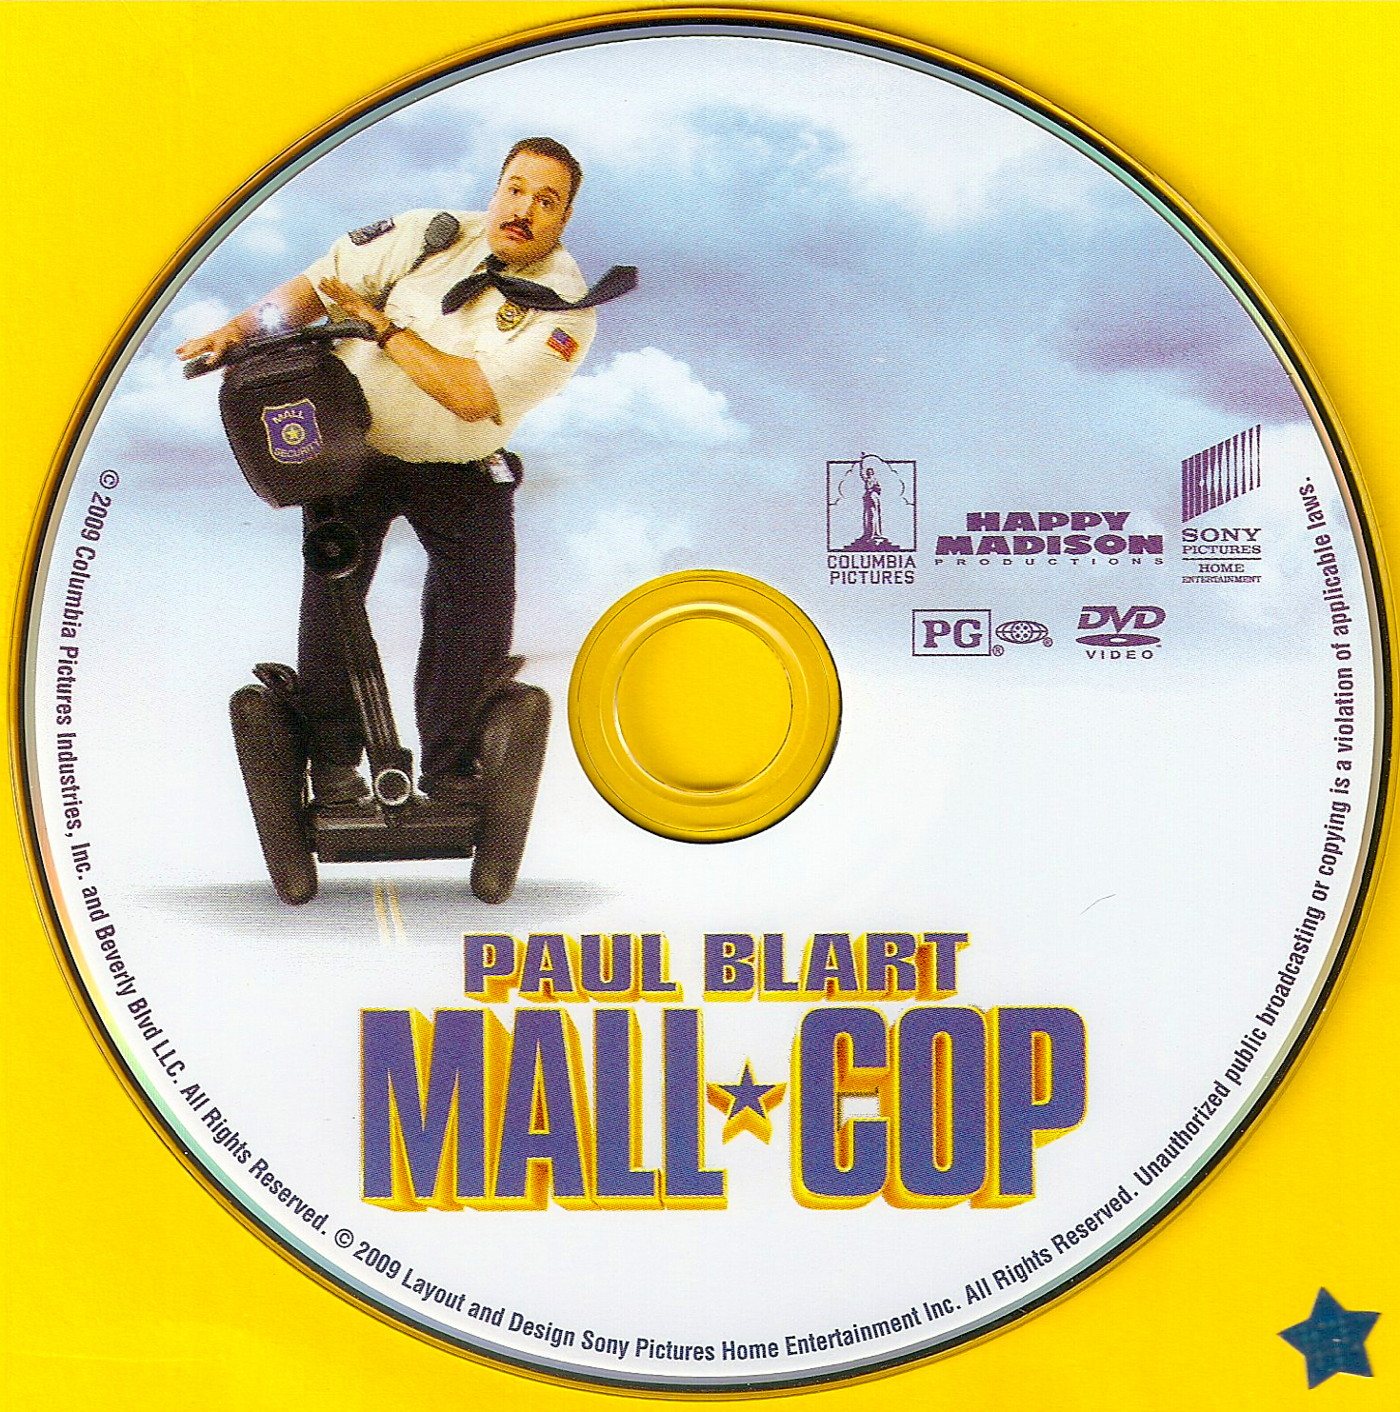 Covers Box Sk Paul Blart Mall Cop 2009 High Quality Dvd Blueray Movie